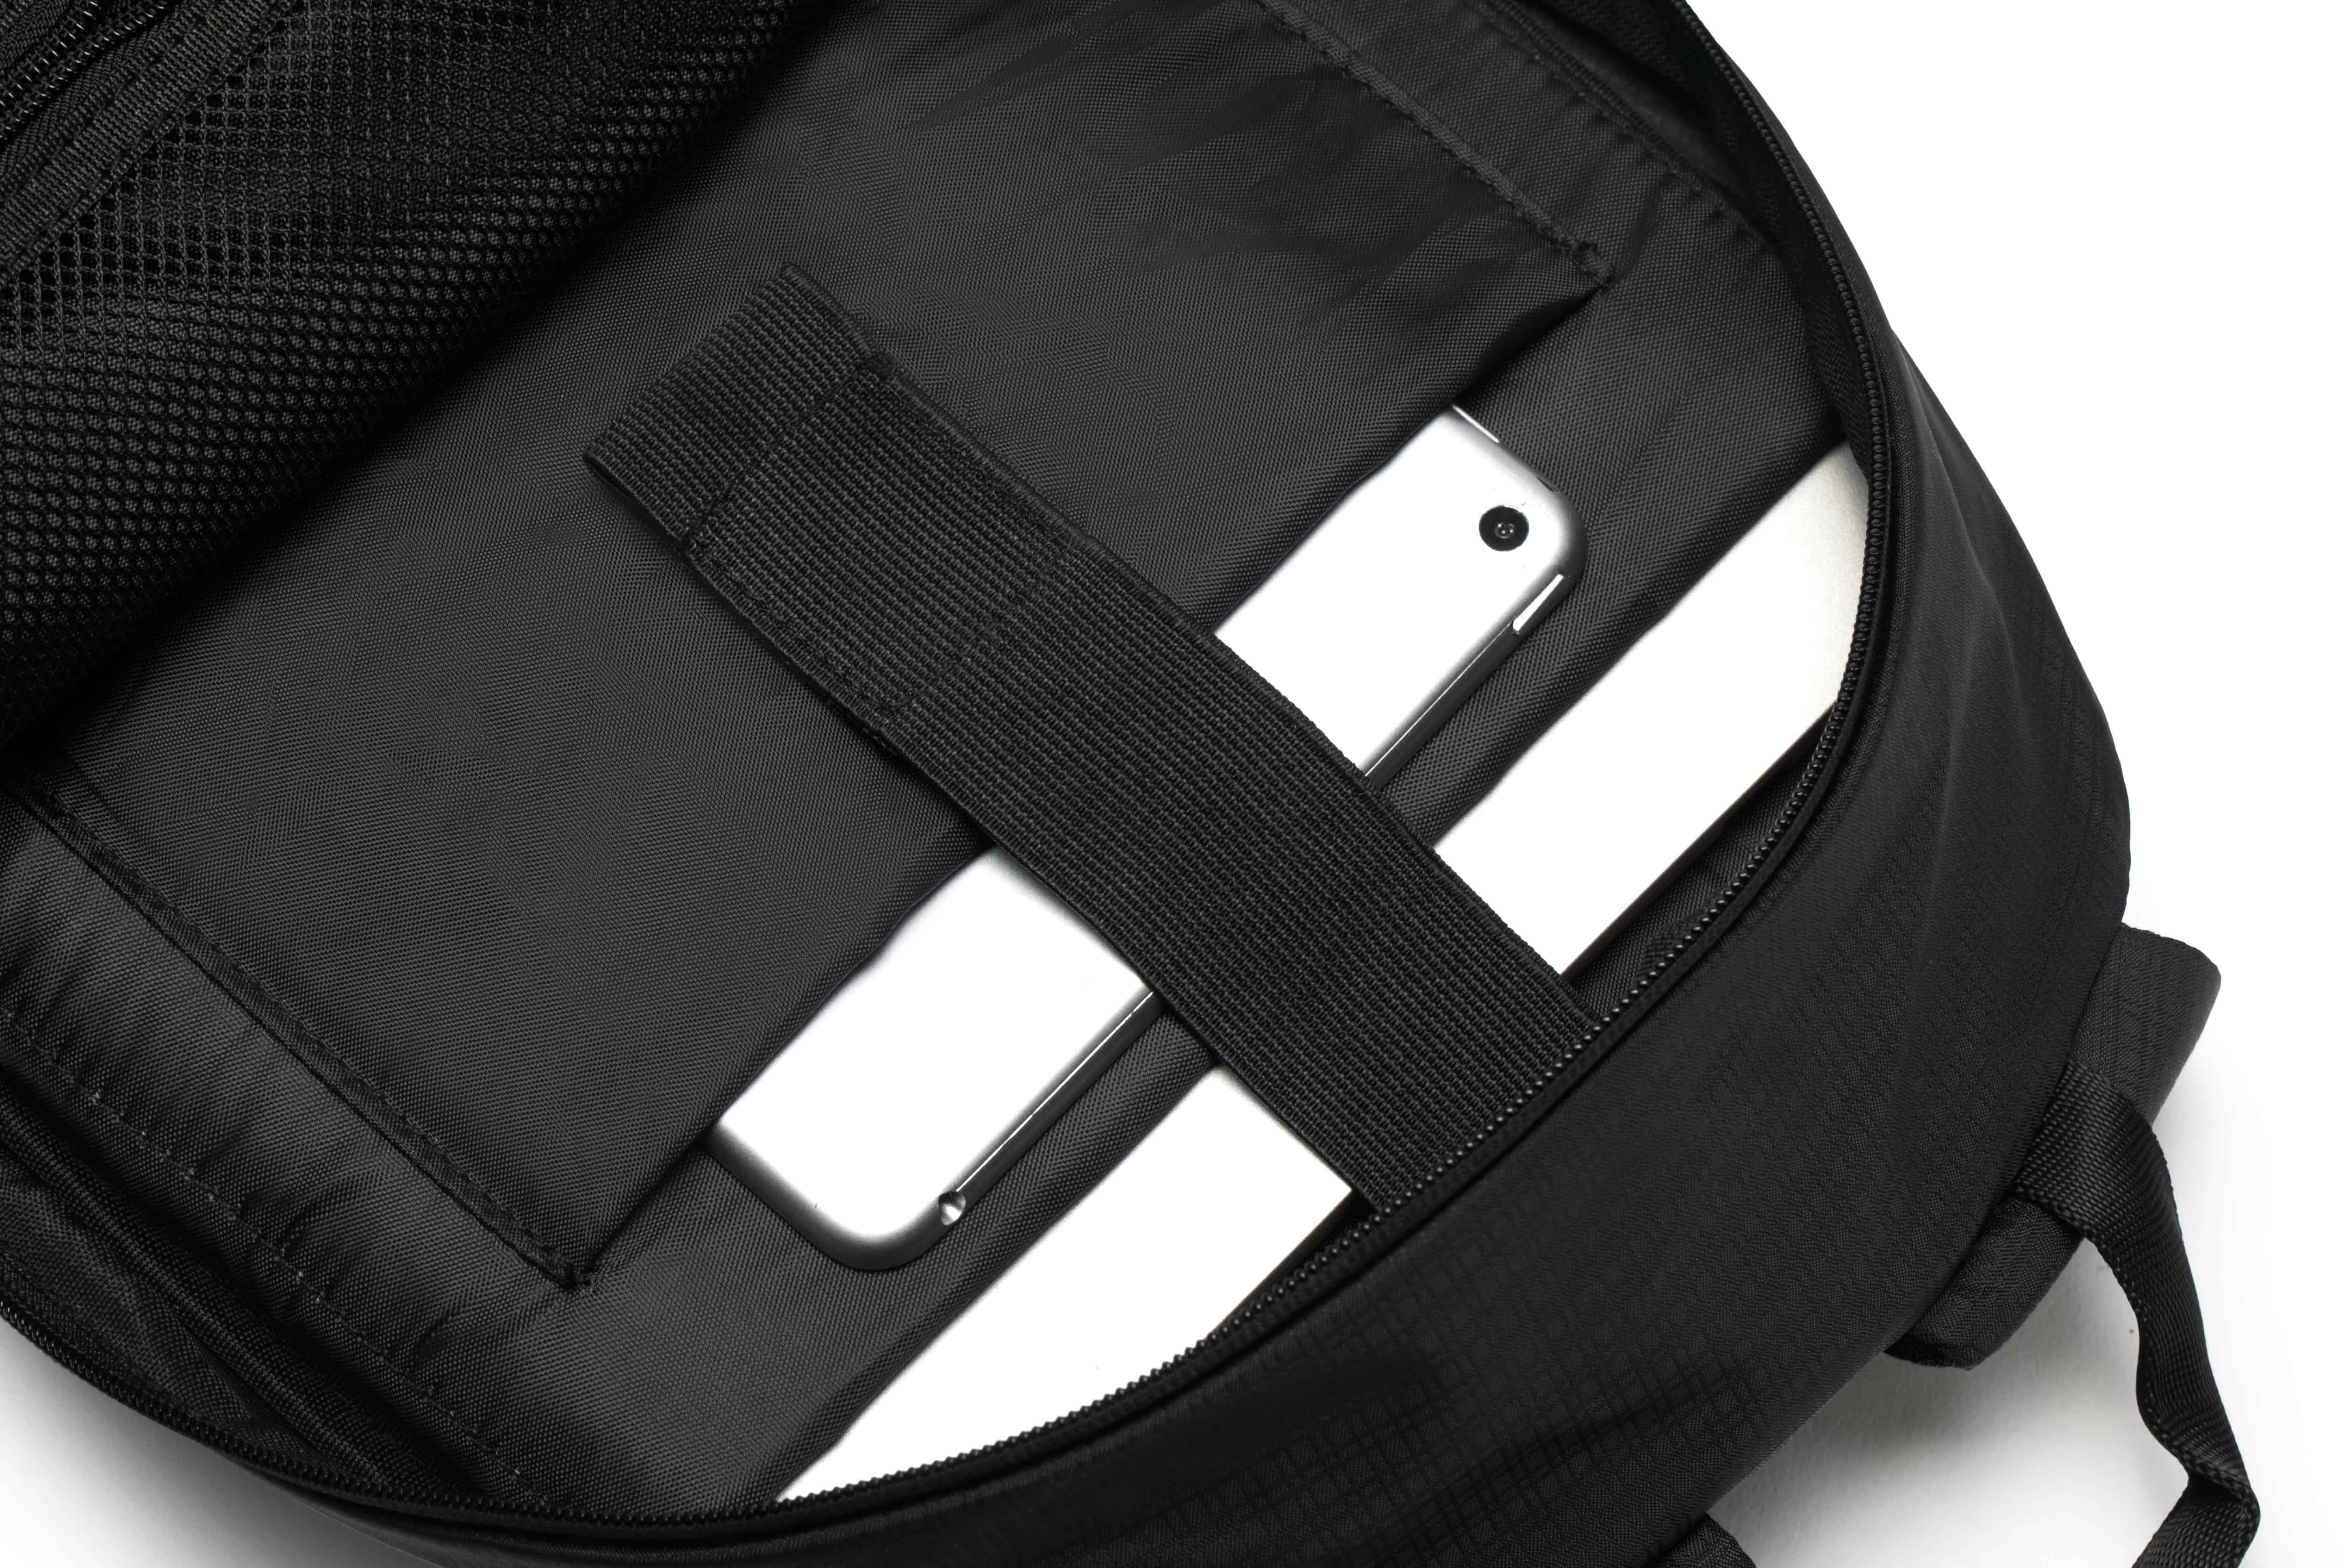 CTY-01 Inner pocket